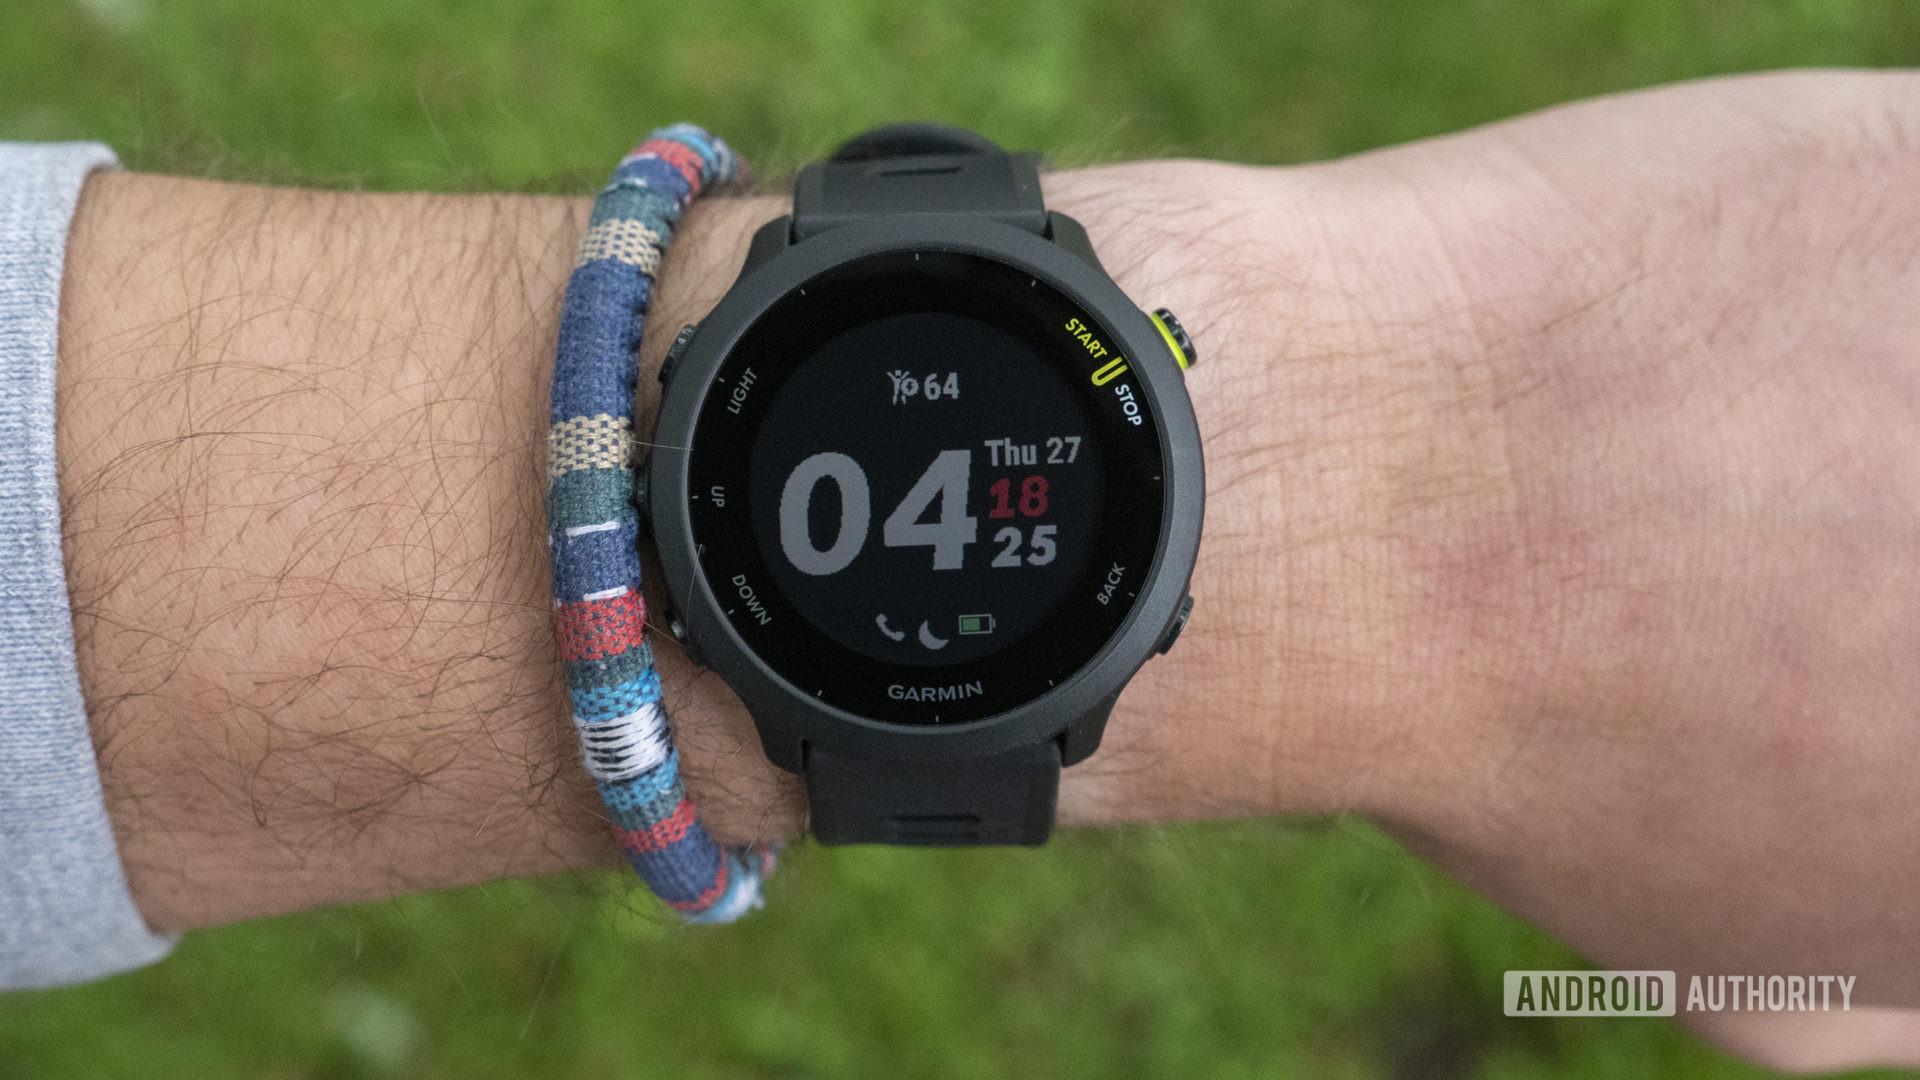 Garmin Forerunner 55 review watch face display on wrist